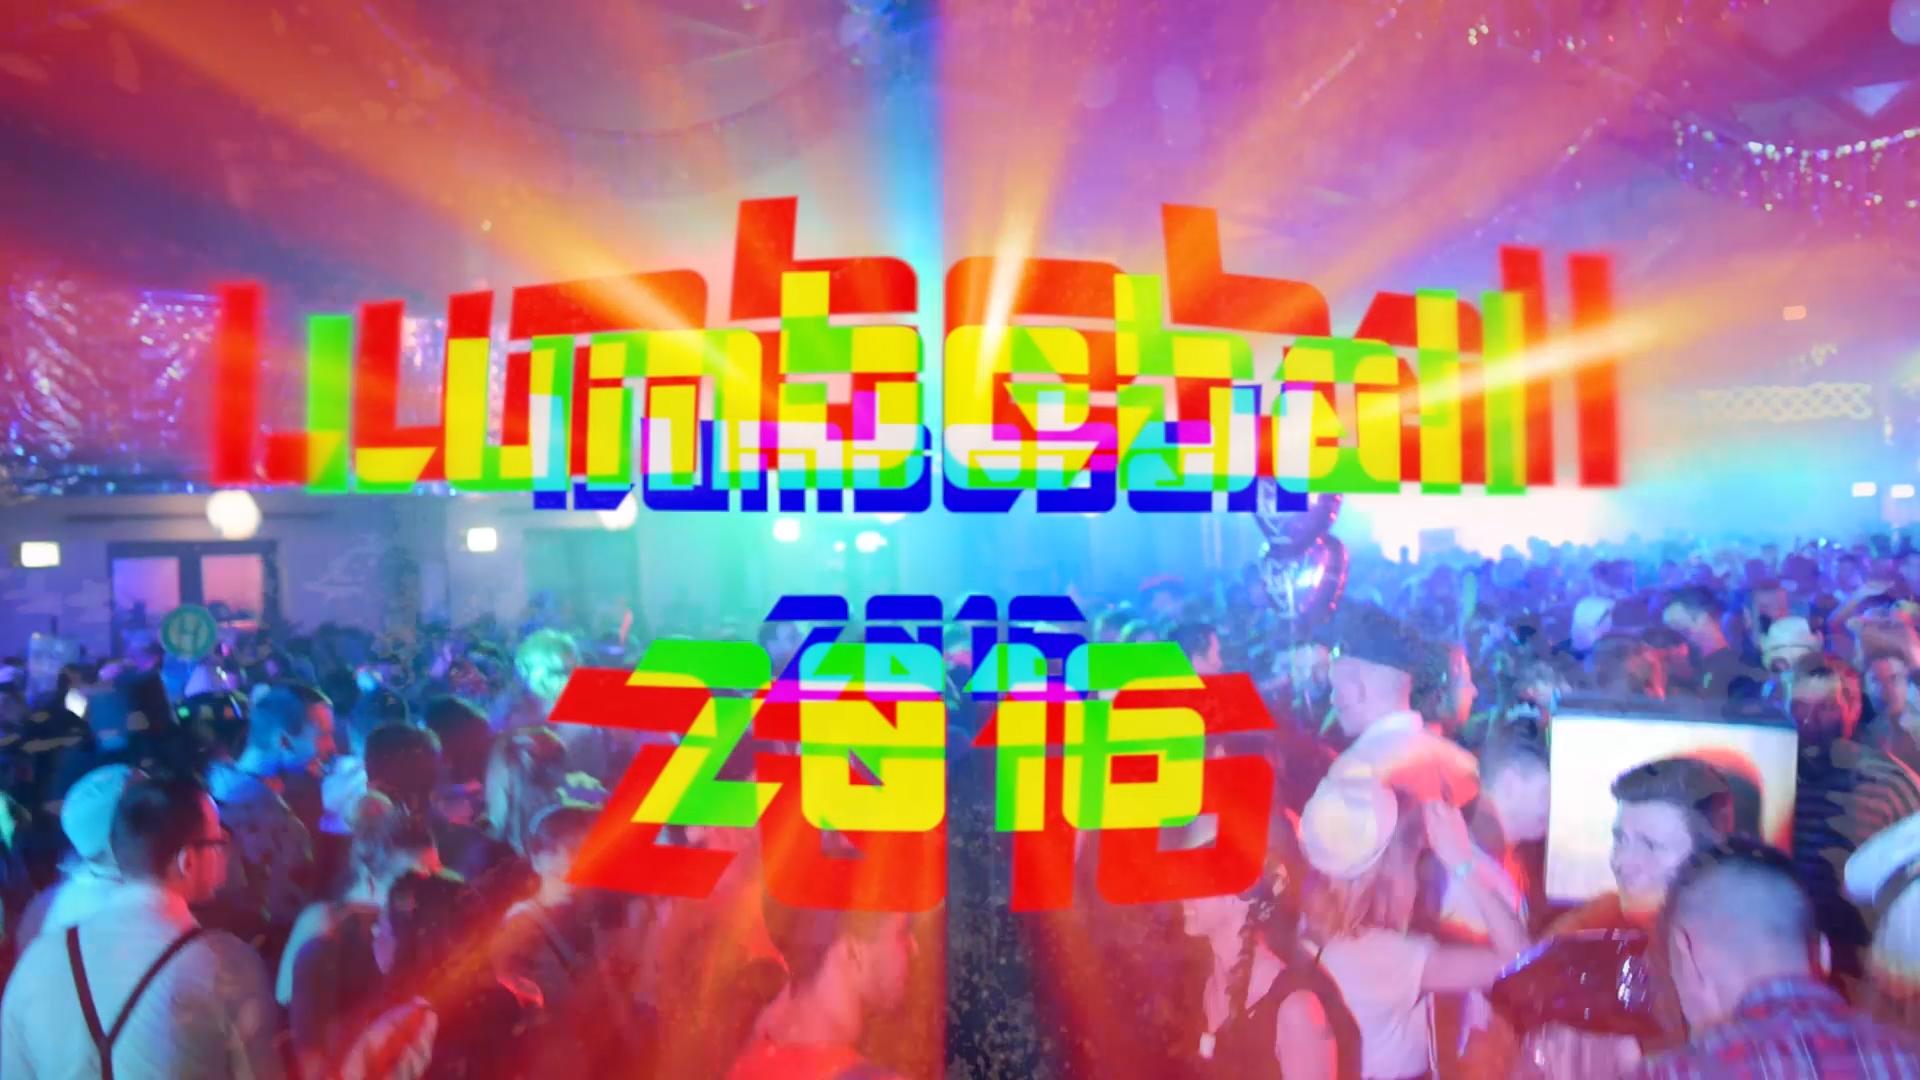 Lumbeball 2016 Teaser